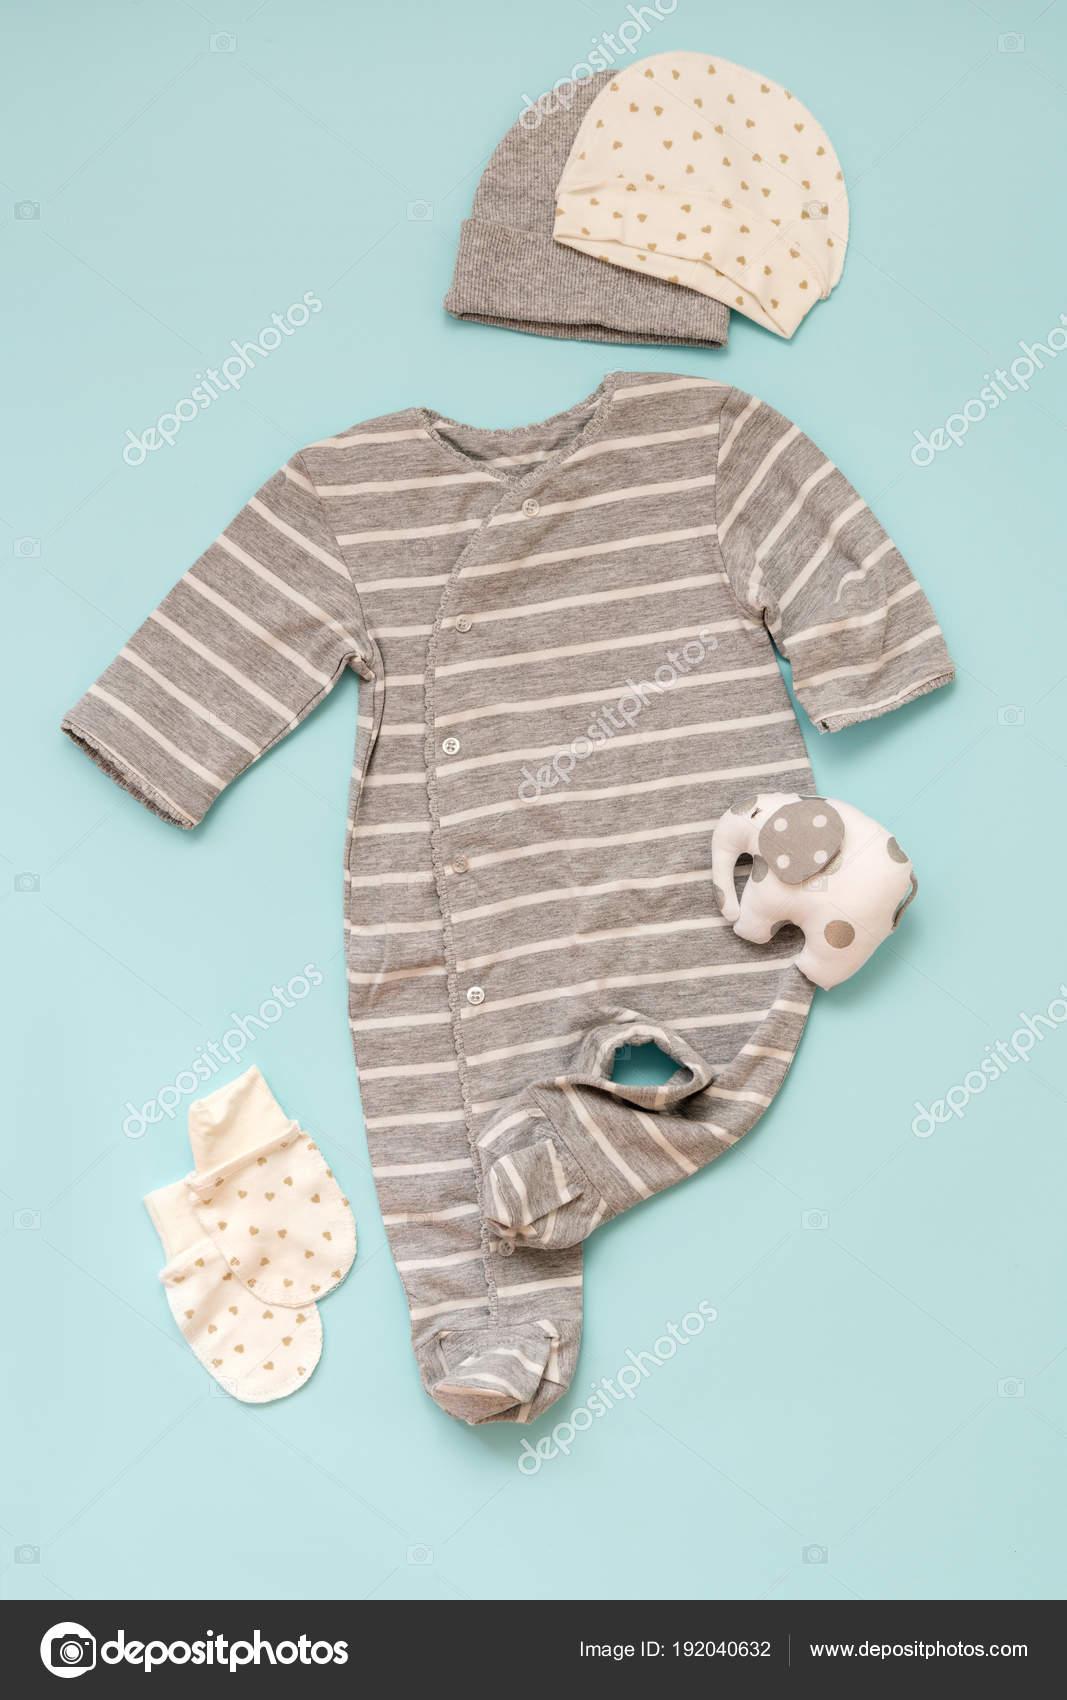 56c097cd34b Σετ Μωρό Ρούχα Για Νεογέννητα Μπλε Φόντο Για Ένα Κορίτσι — Φωτογραφία  Αρχείου